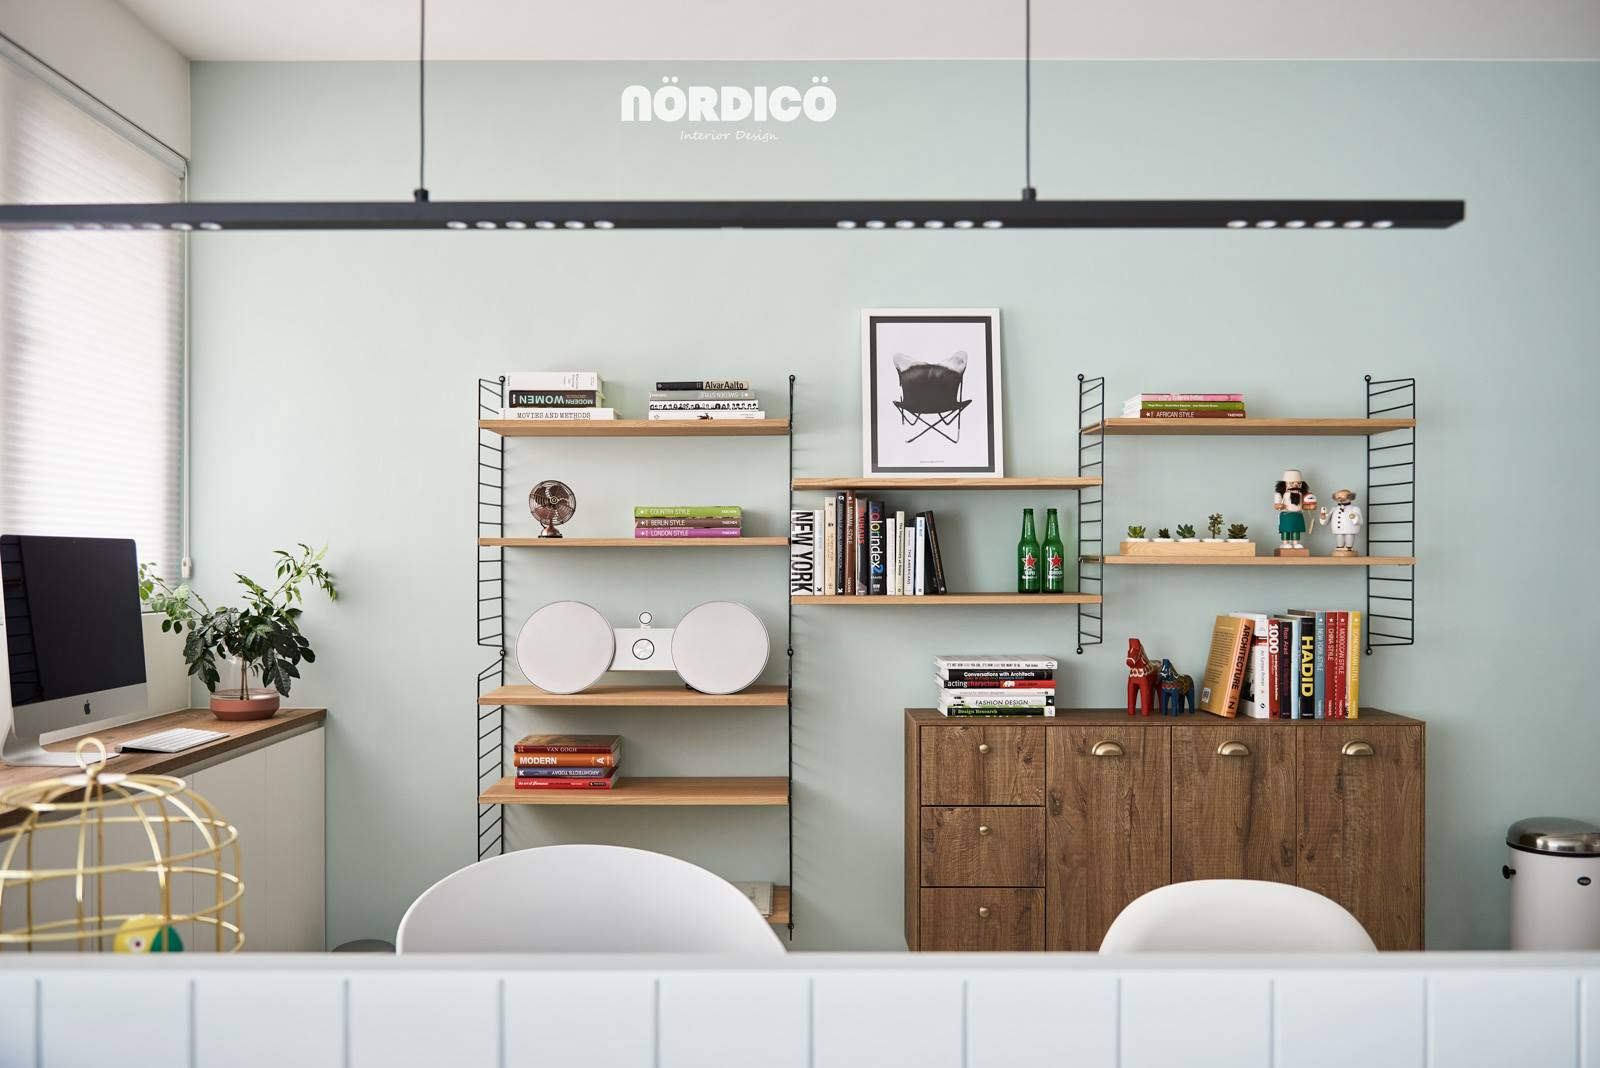 Nordic Decor Inspiration In Two Colorful Homes | Interior Design Blog